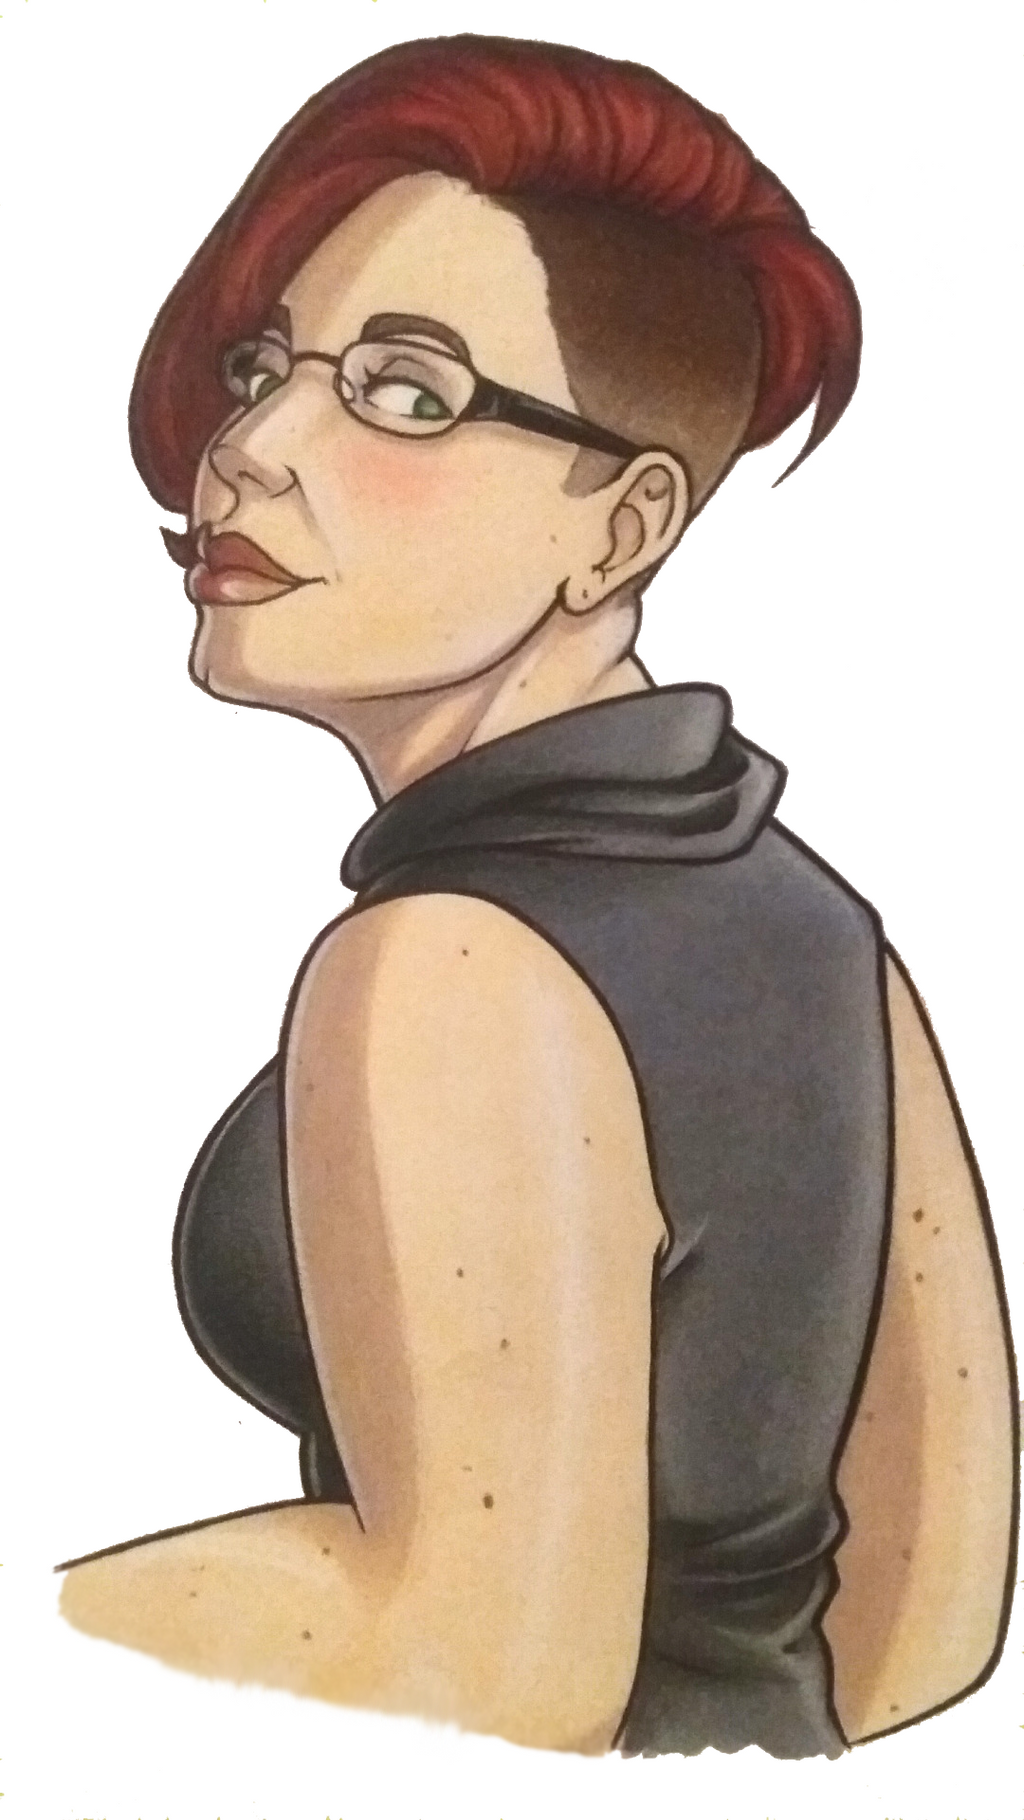 RavenScarlett's Profile Picture